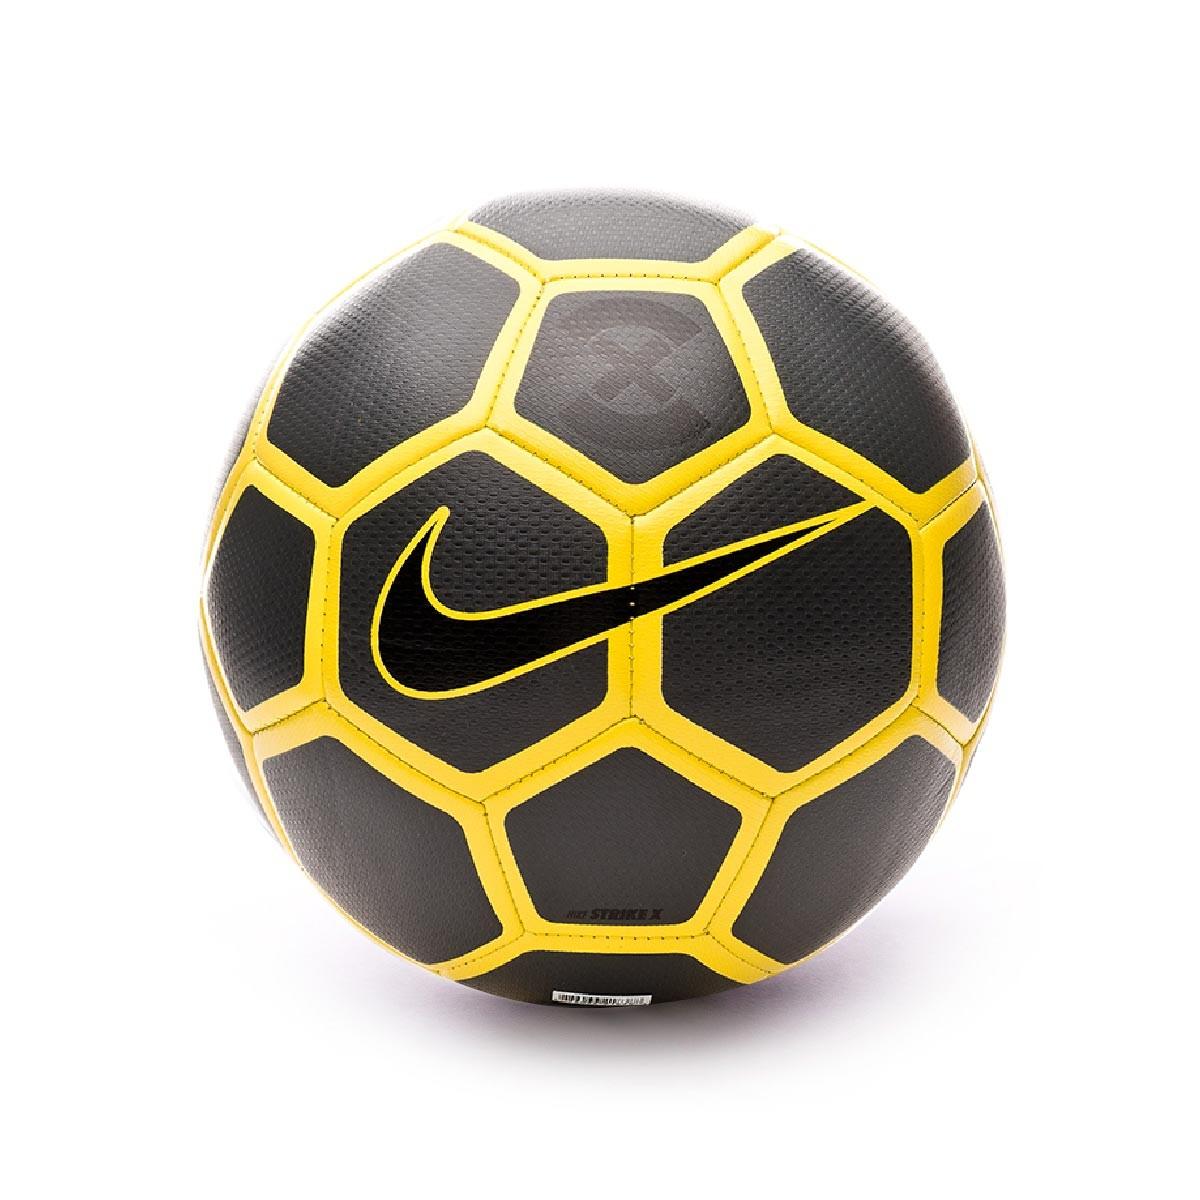 Amargura Penélope Consciente  Ball Nike Strike X 2018-2019 Anthracite-Optical yellow-Black - Football  store Fútbol Emotion